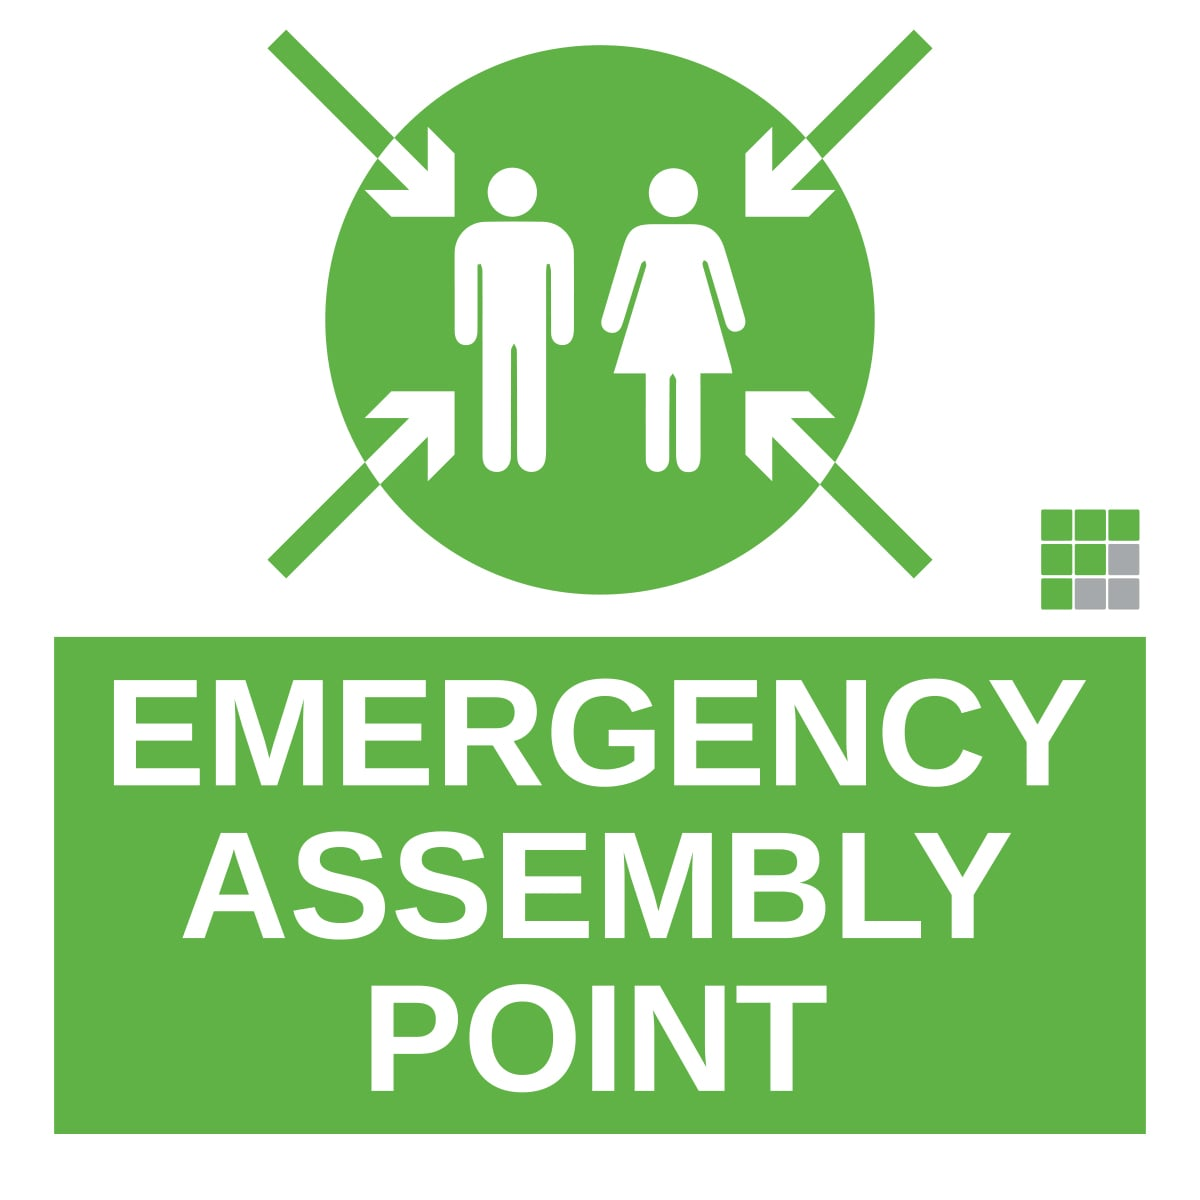 emergency assembly point - 1x1ft.jpg